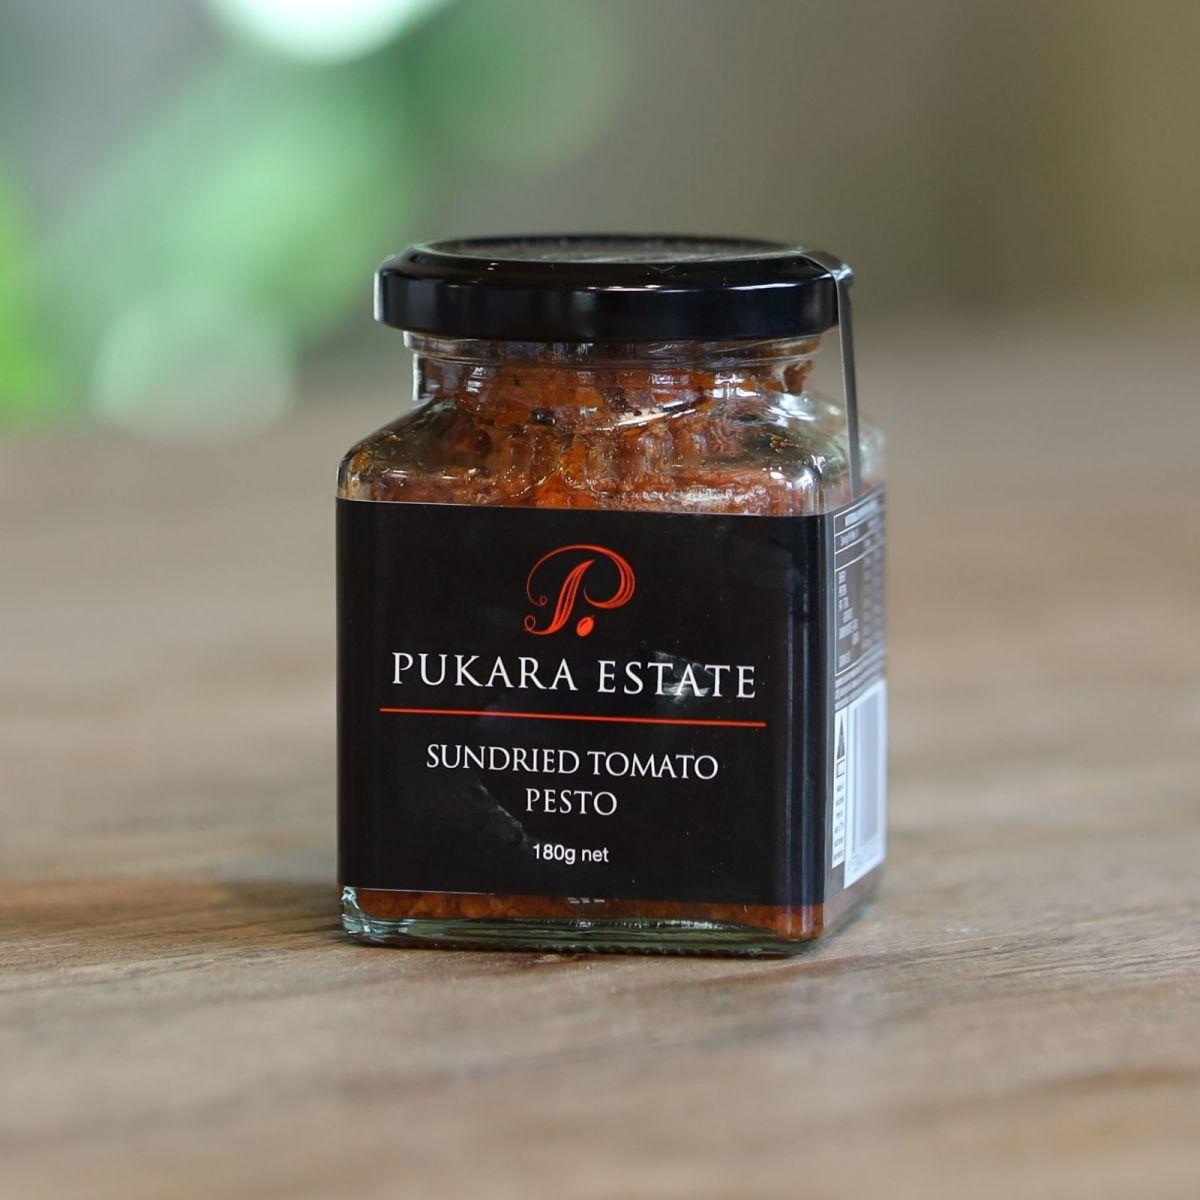 Pukara Estate - Sundried Tomato Pesto